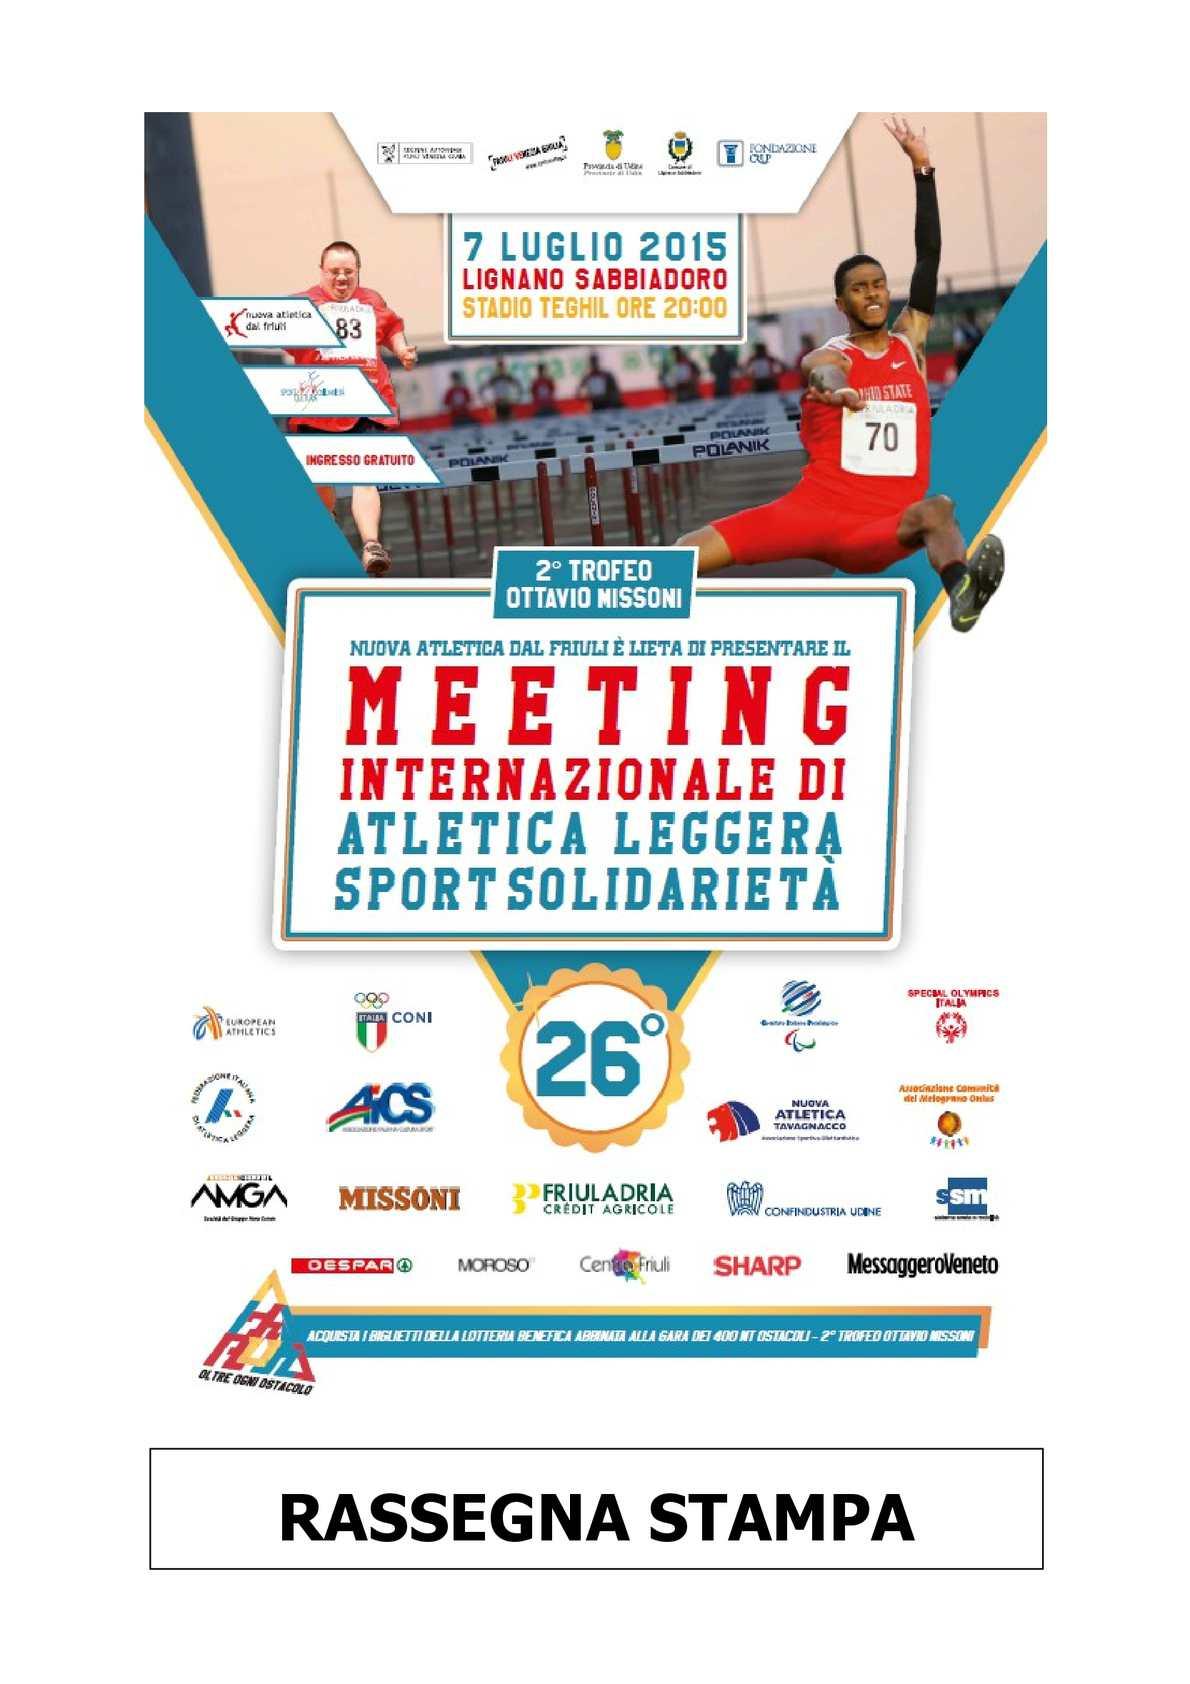 new product 75178 3ad3b Calaméo - 2015 - Rassegna Stampa - 26° Meeting Sport Solidarietà 2° Trofeo  Ottavio Missoni - Rassegna Stampa